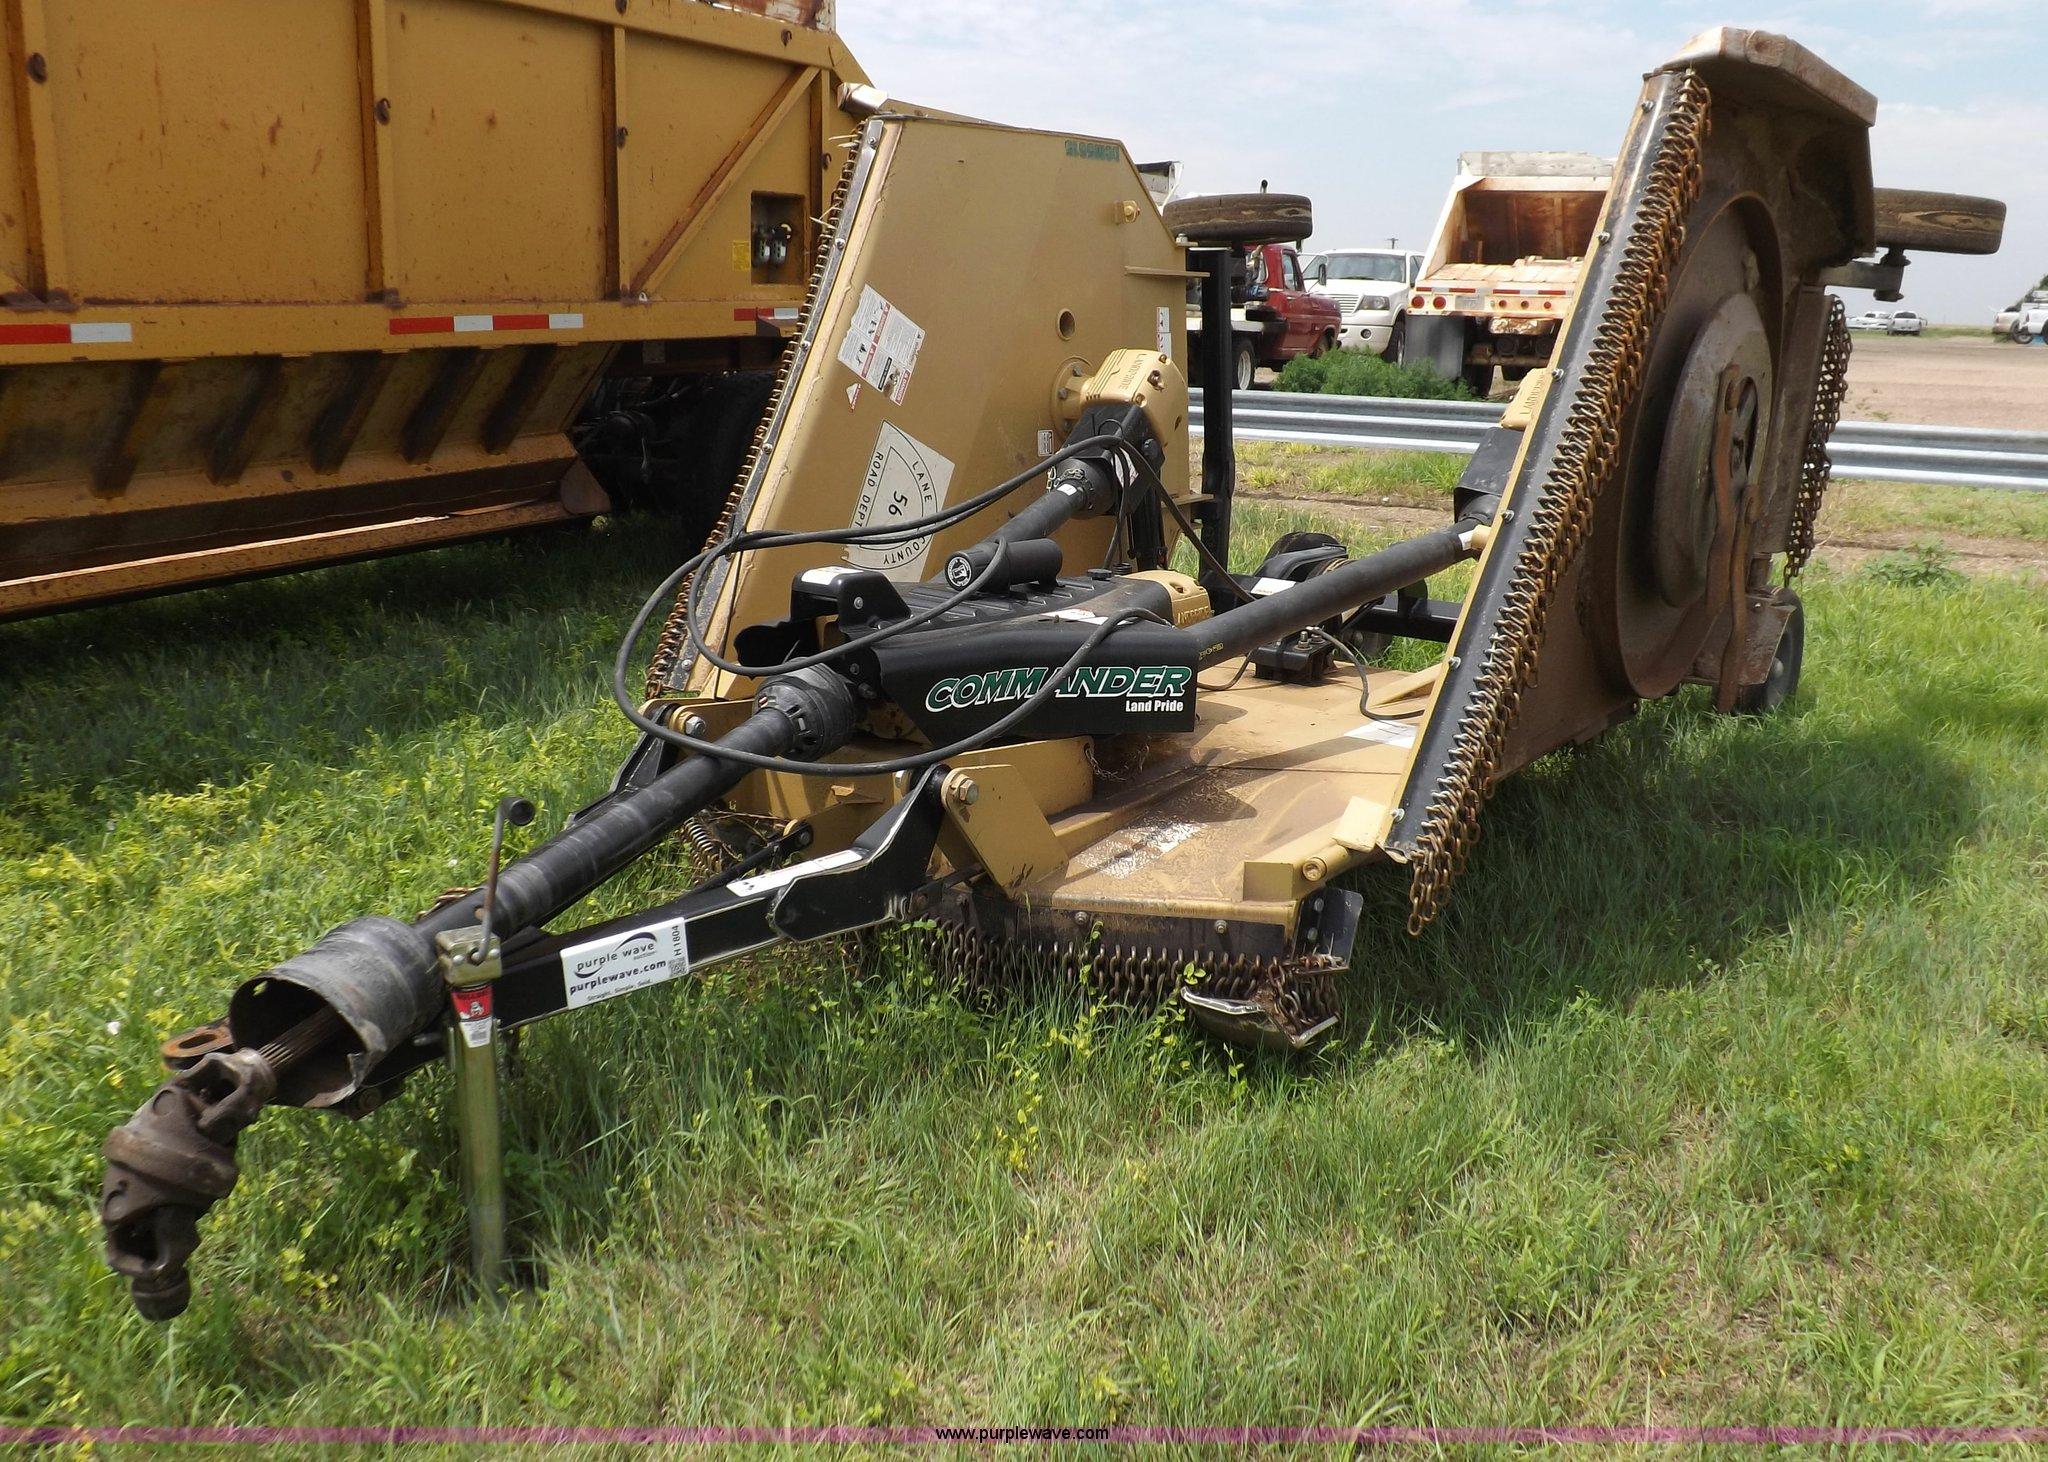 Land Pride RCM5515 Commander batwing rotary mower | Item H18